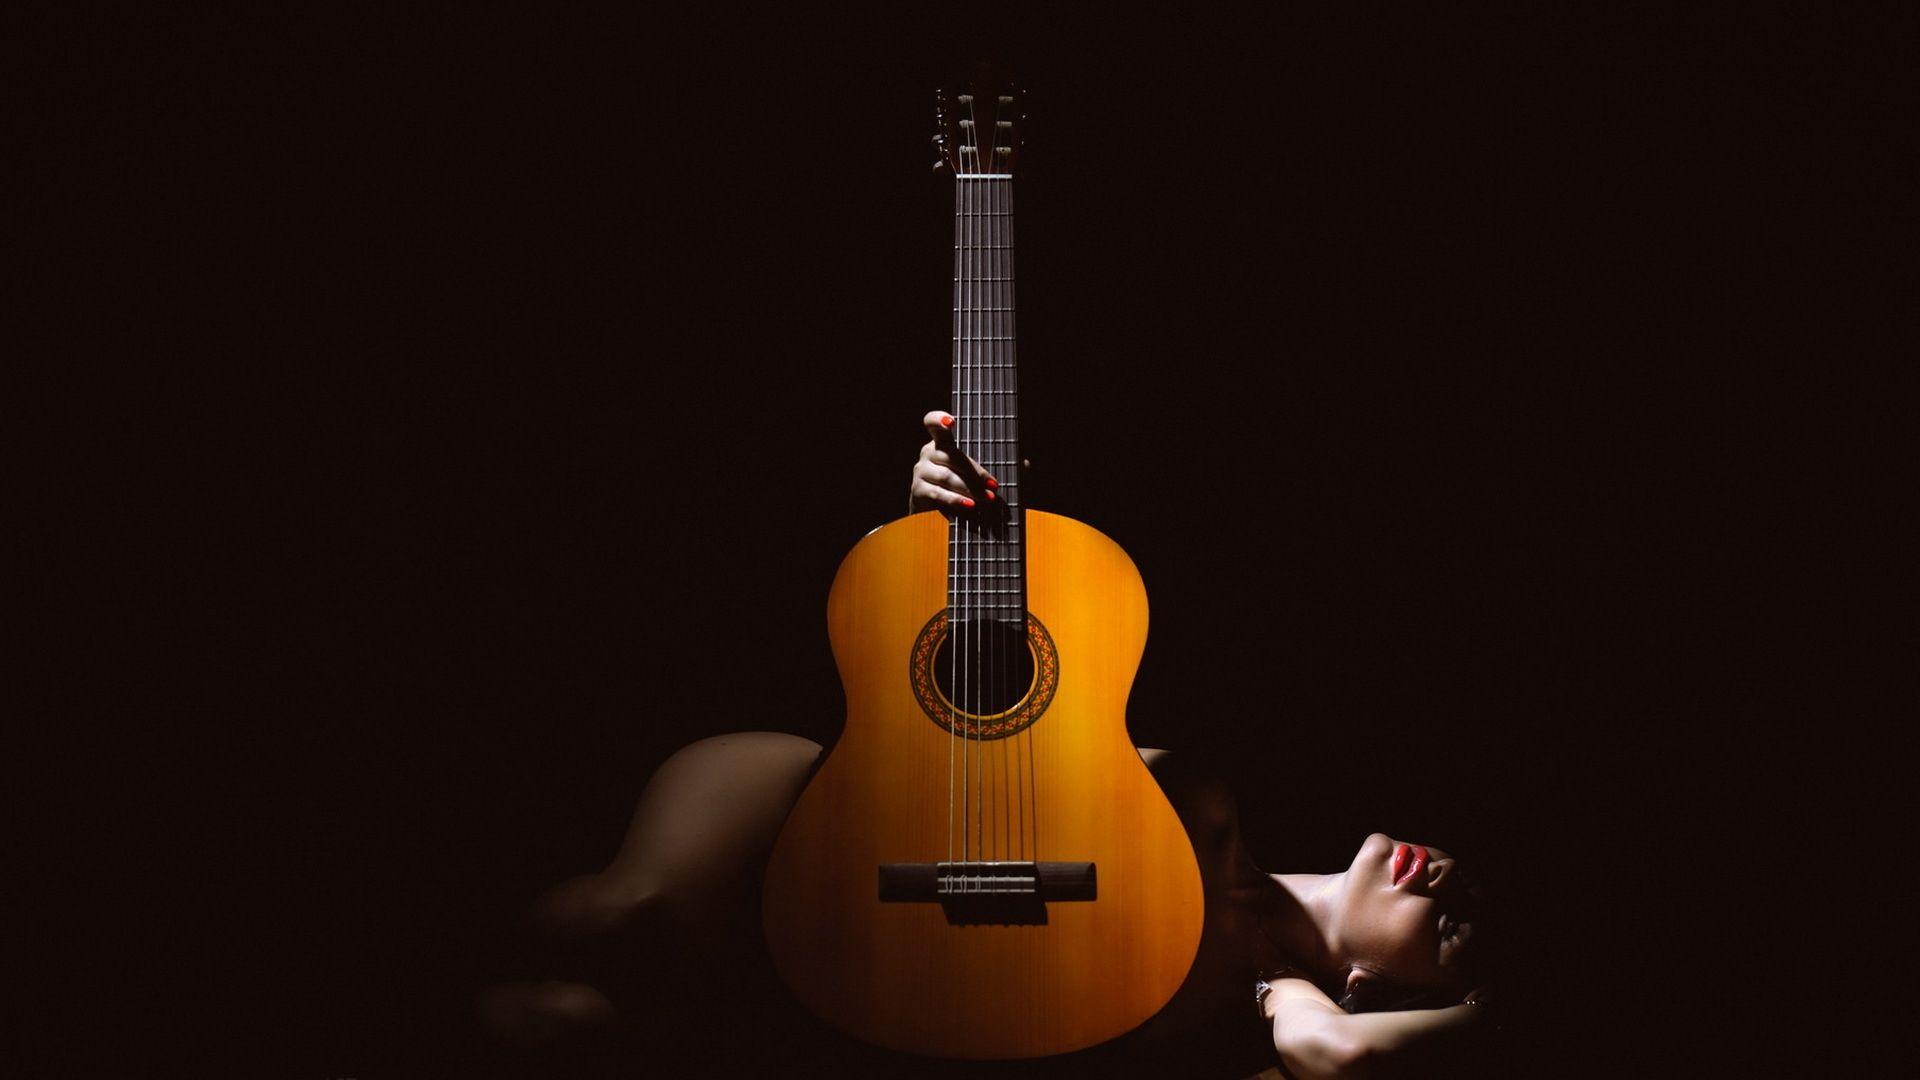 Acoustic Guitar, PC Wallpaper